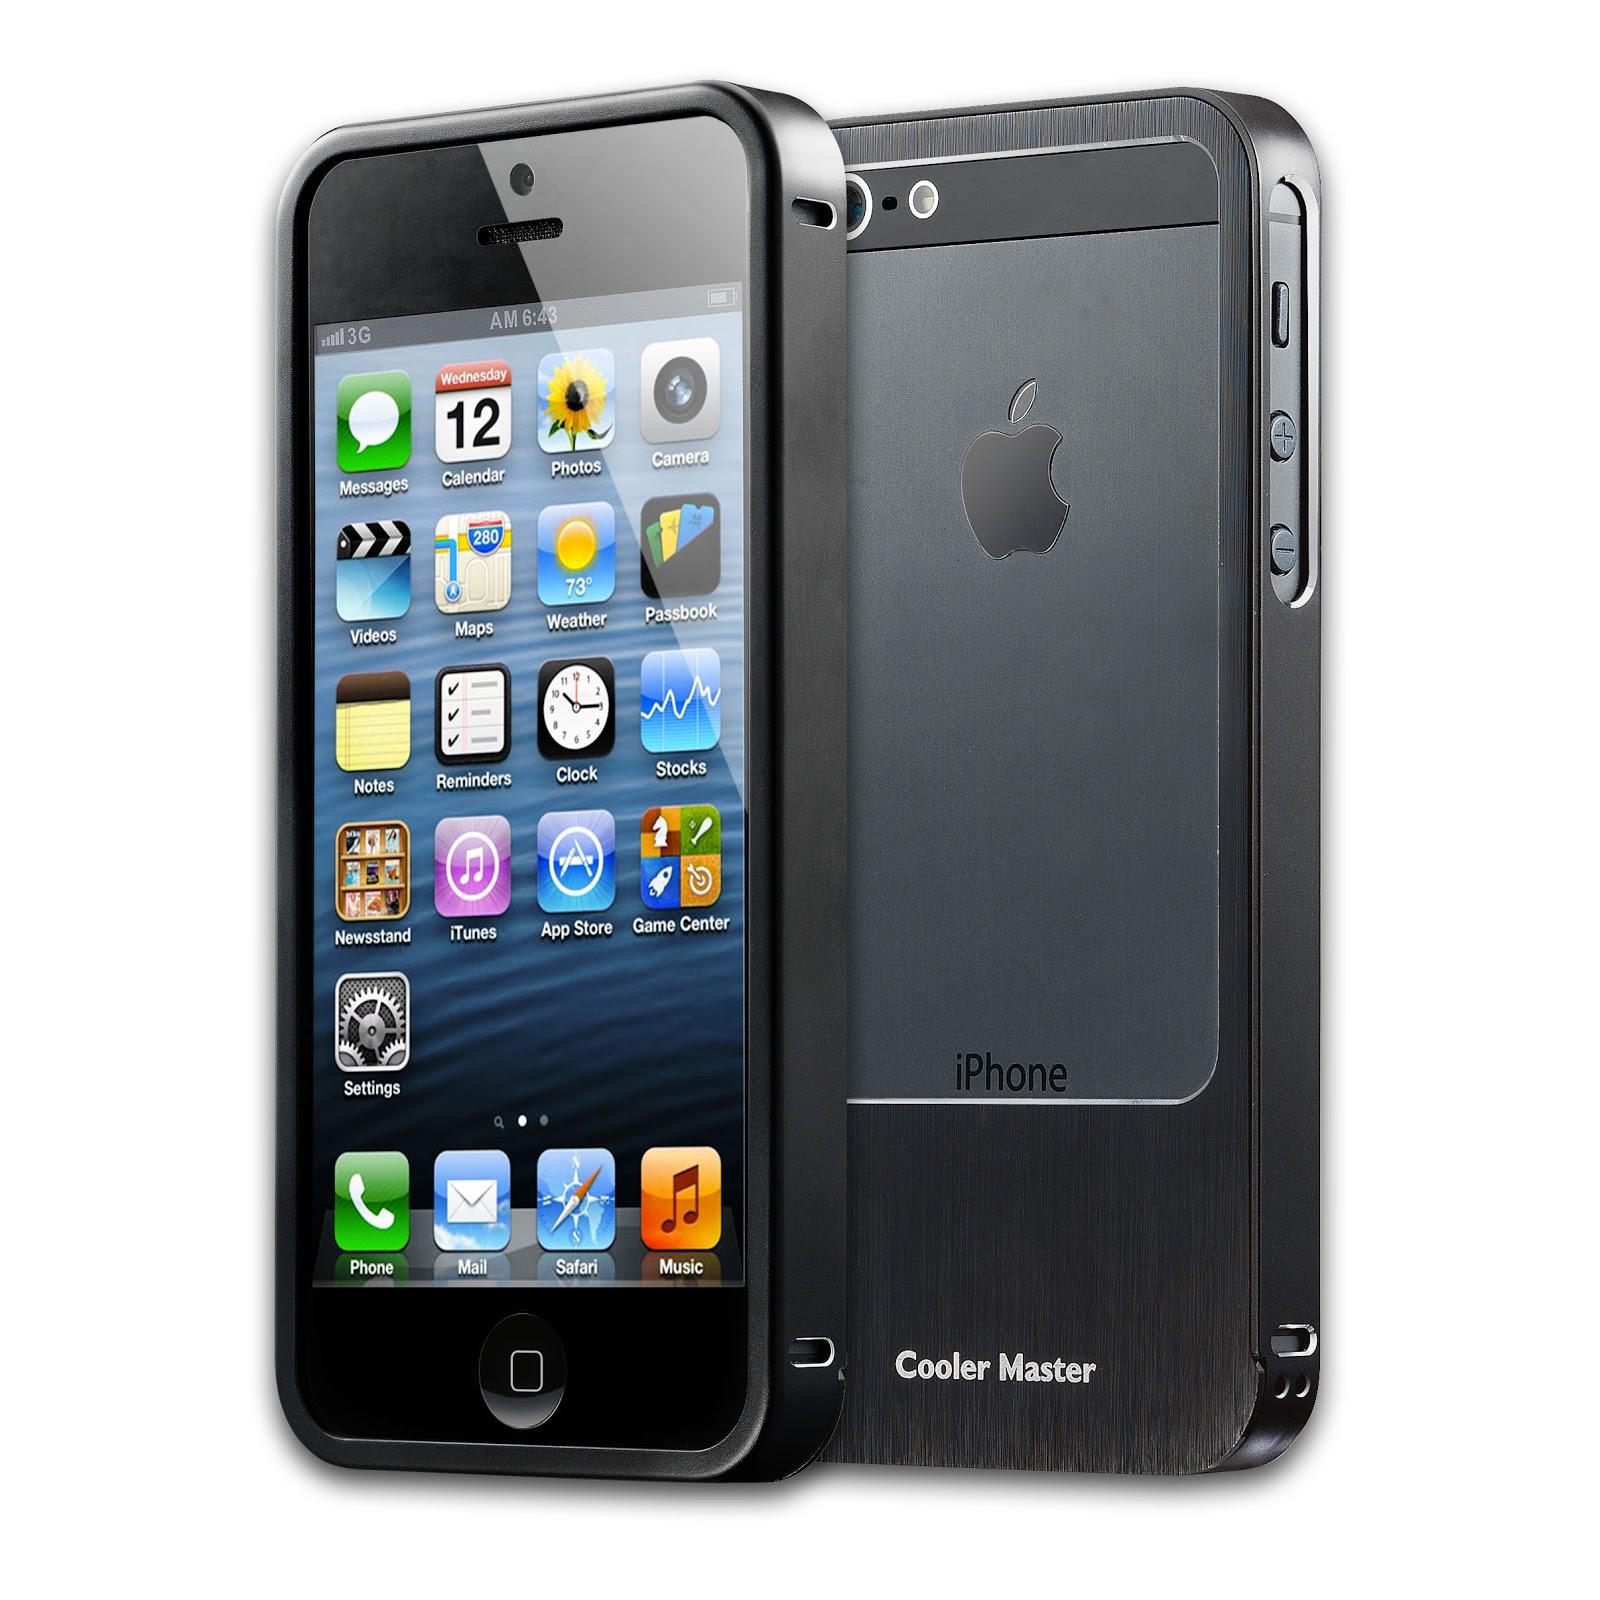 http://3.bp.blogspot.com/-D02R9OVArfM/UIadNJgwXKI/AAAAAAAAIzQ/3o0LZH6-09w/s1600/iPhone%205%20Aluminum%20Bumper-Black-01.jpg